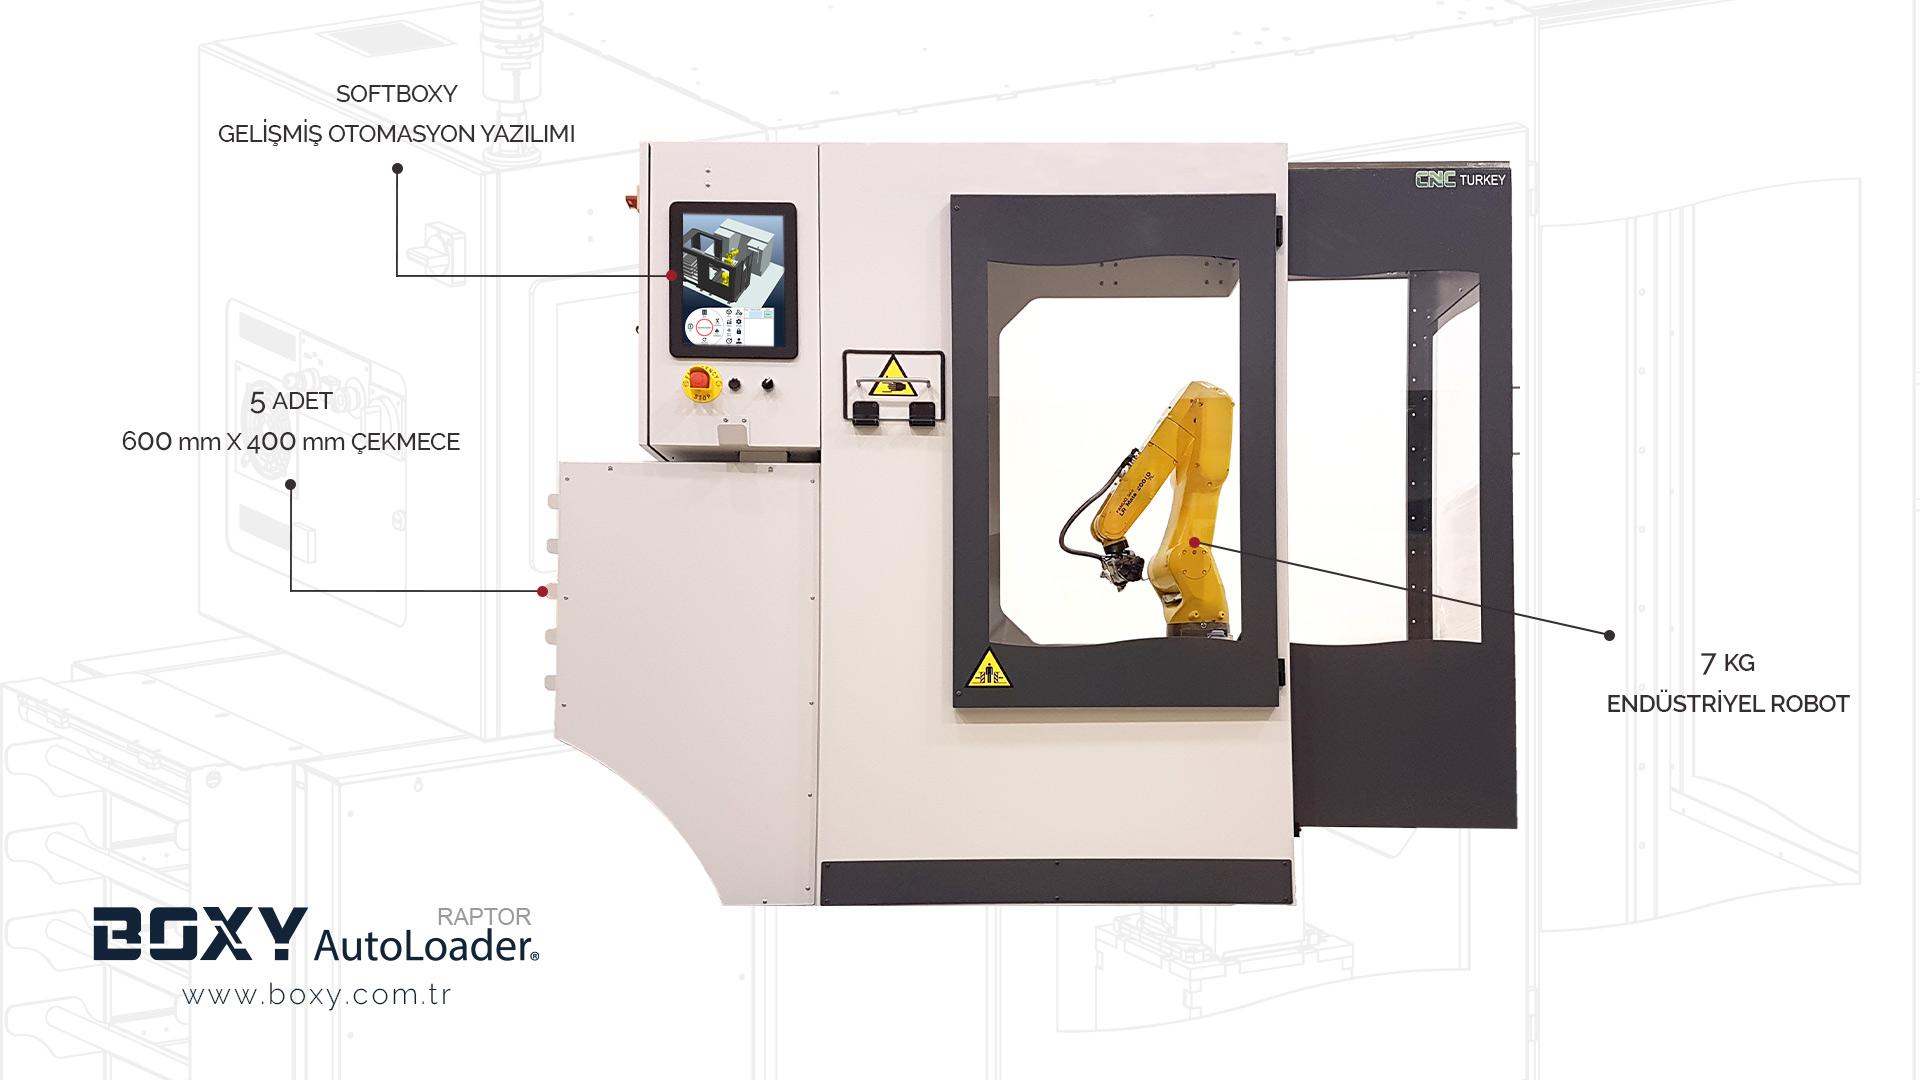 Robot Otomasyon Probe Teknolojisi – Boxy Autoloader